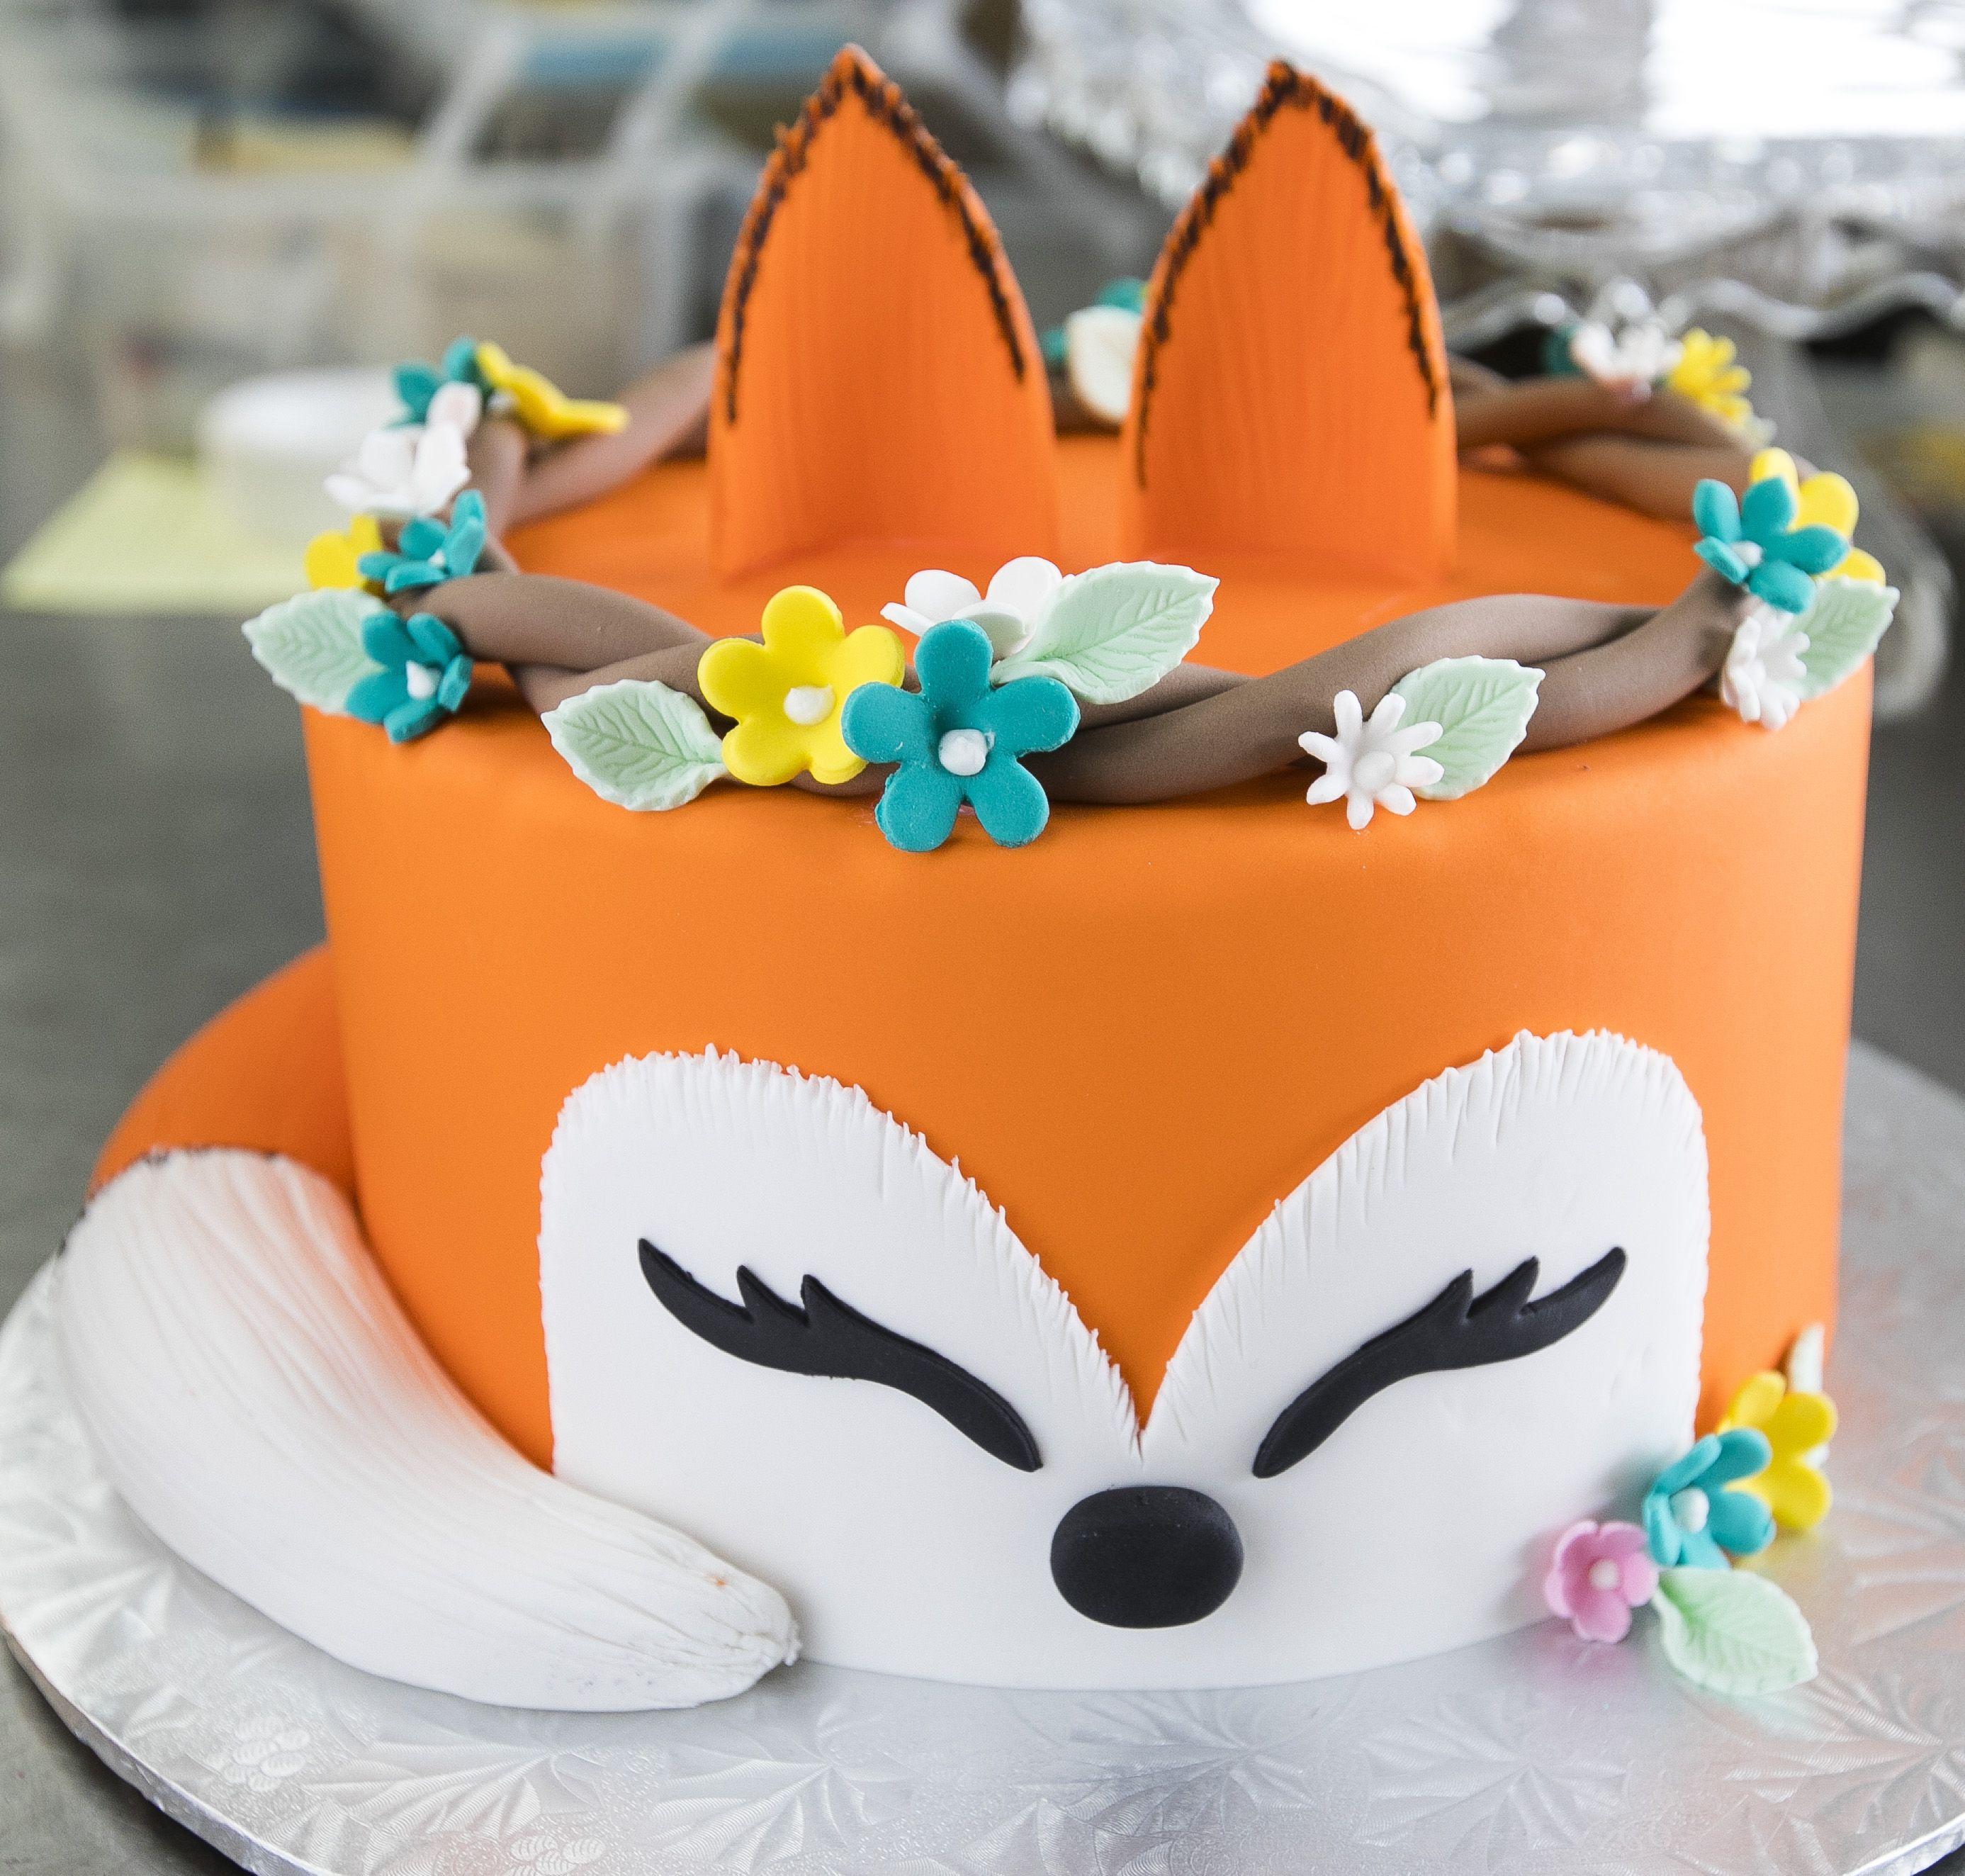 Doraemon Cakes For To Celebrate Your Kids Birthdays Kidsbirthdaycakes Doraemoncakes Cakefeasta Doraemon Cake Animal Birthday Cakes Cake